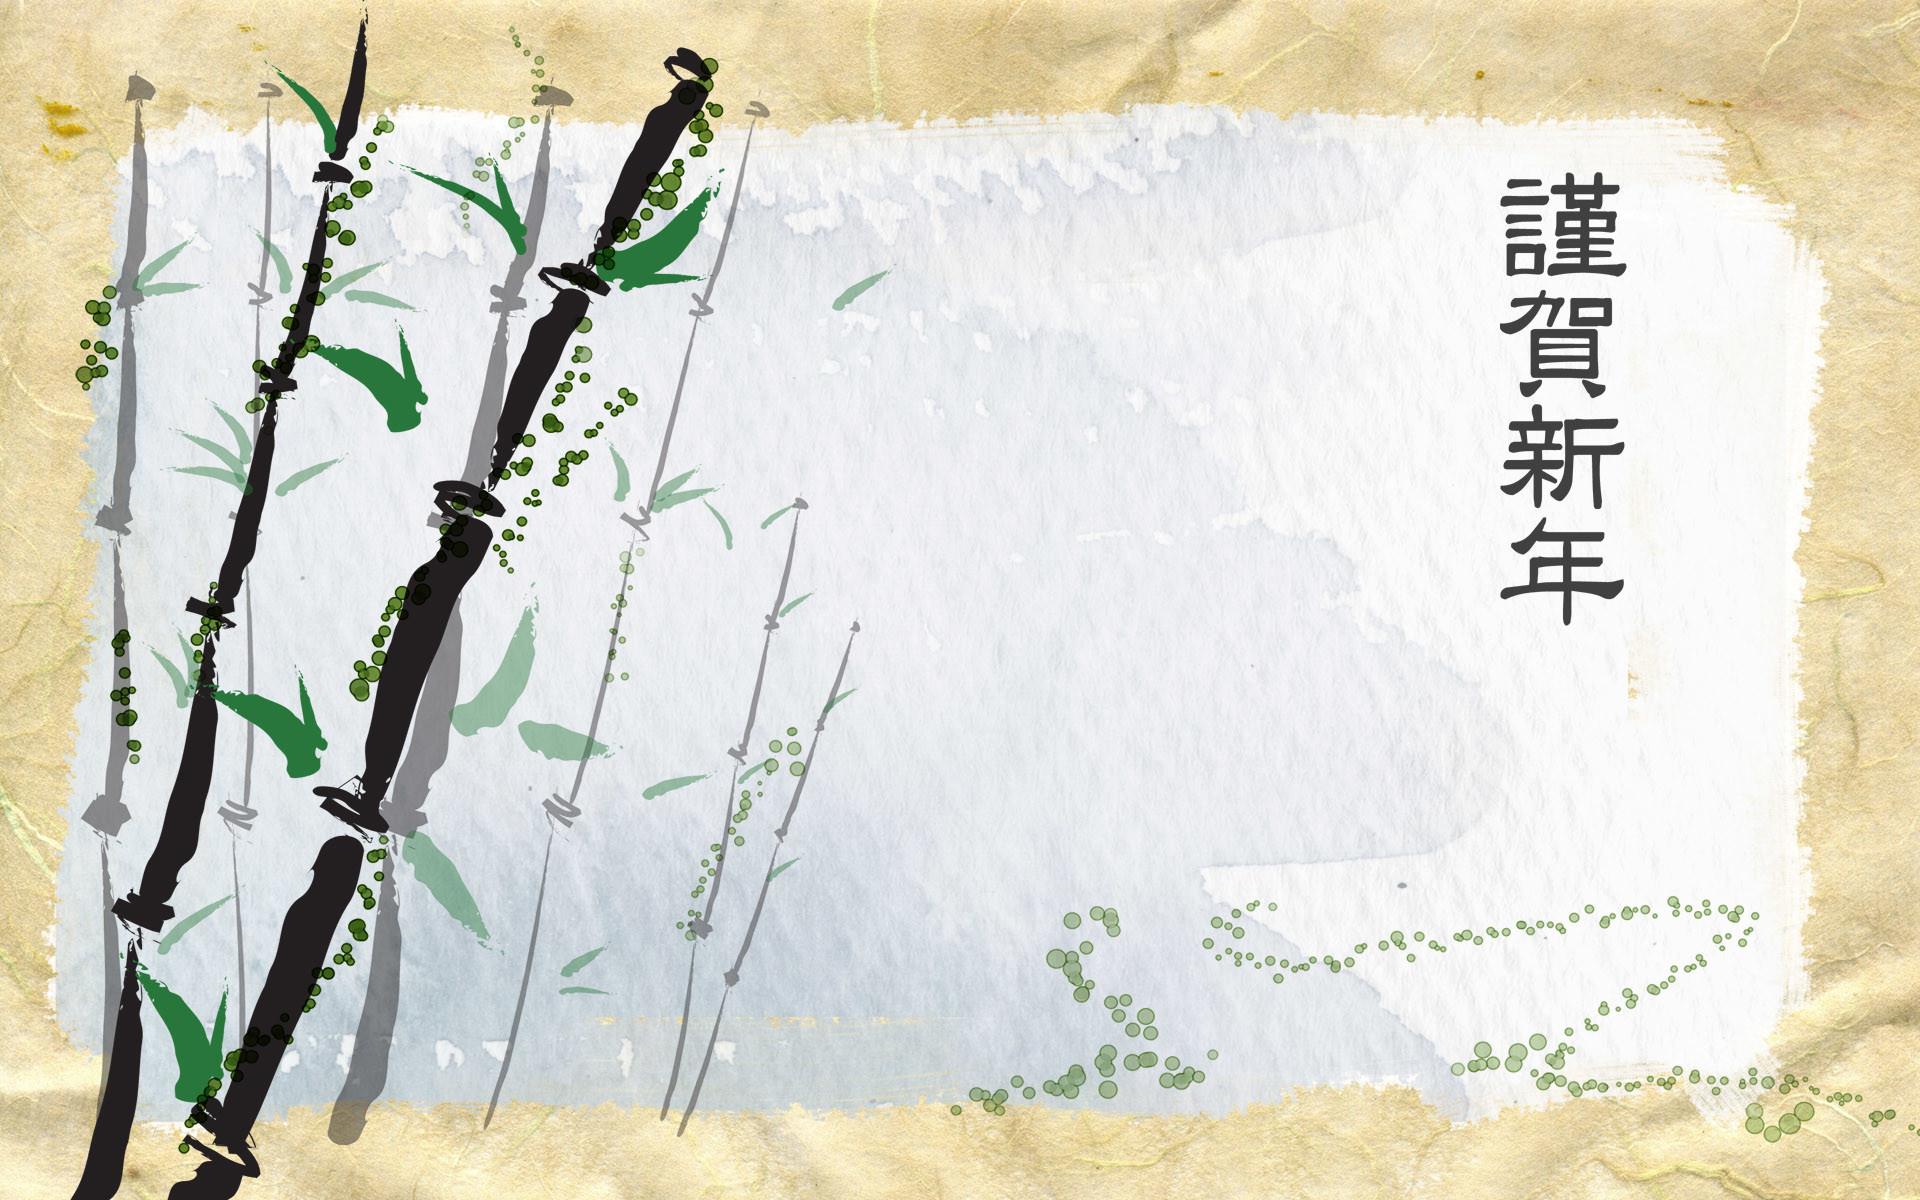 Japanese Art Wallpapers 19, Japanese Art Wallpaper